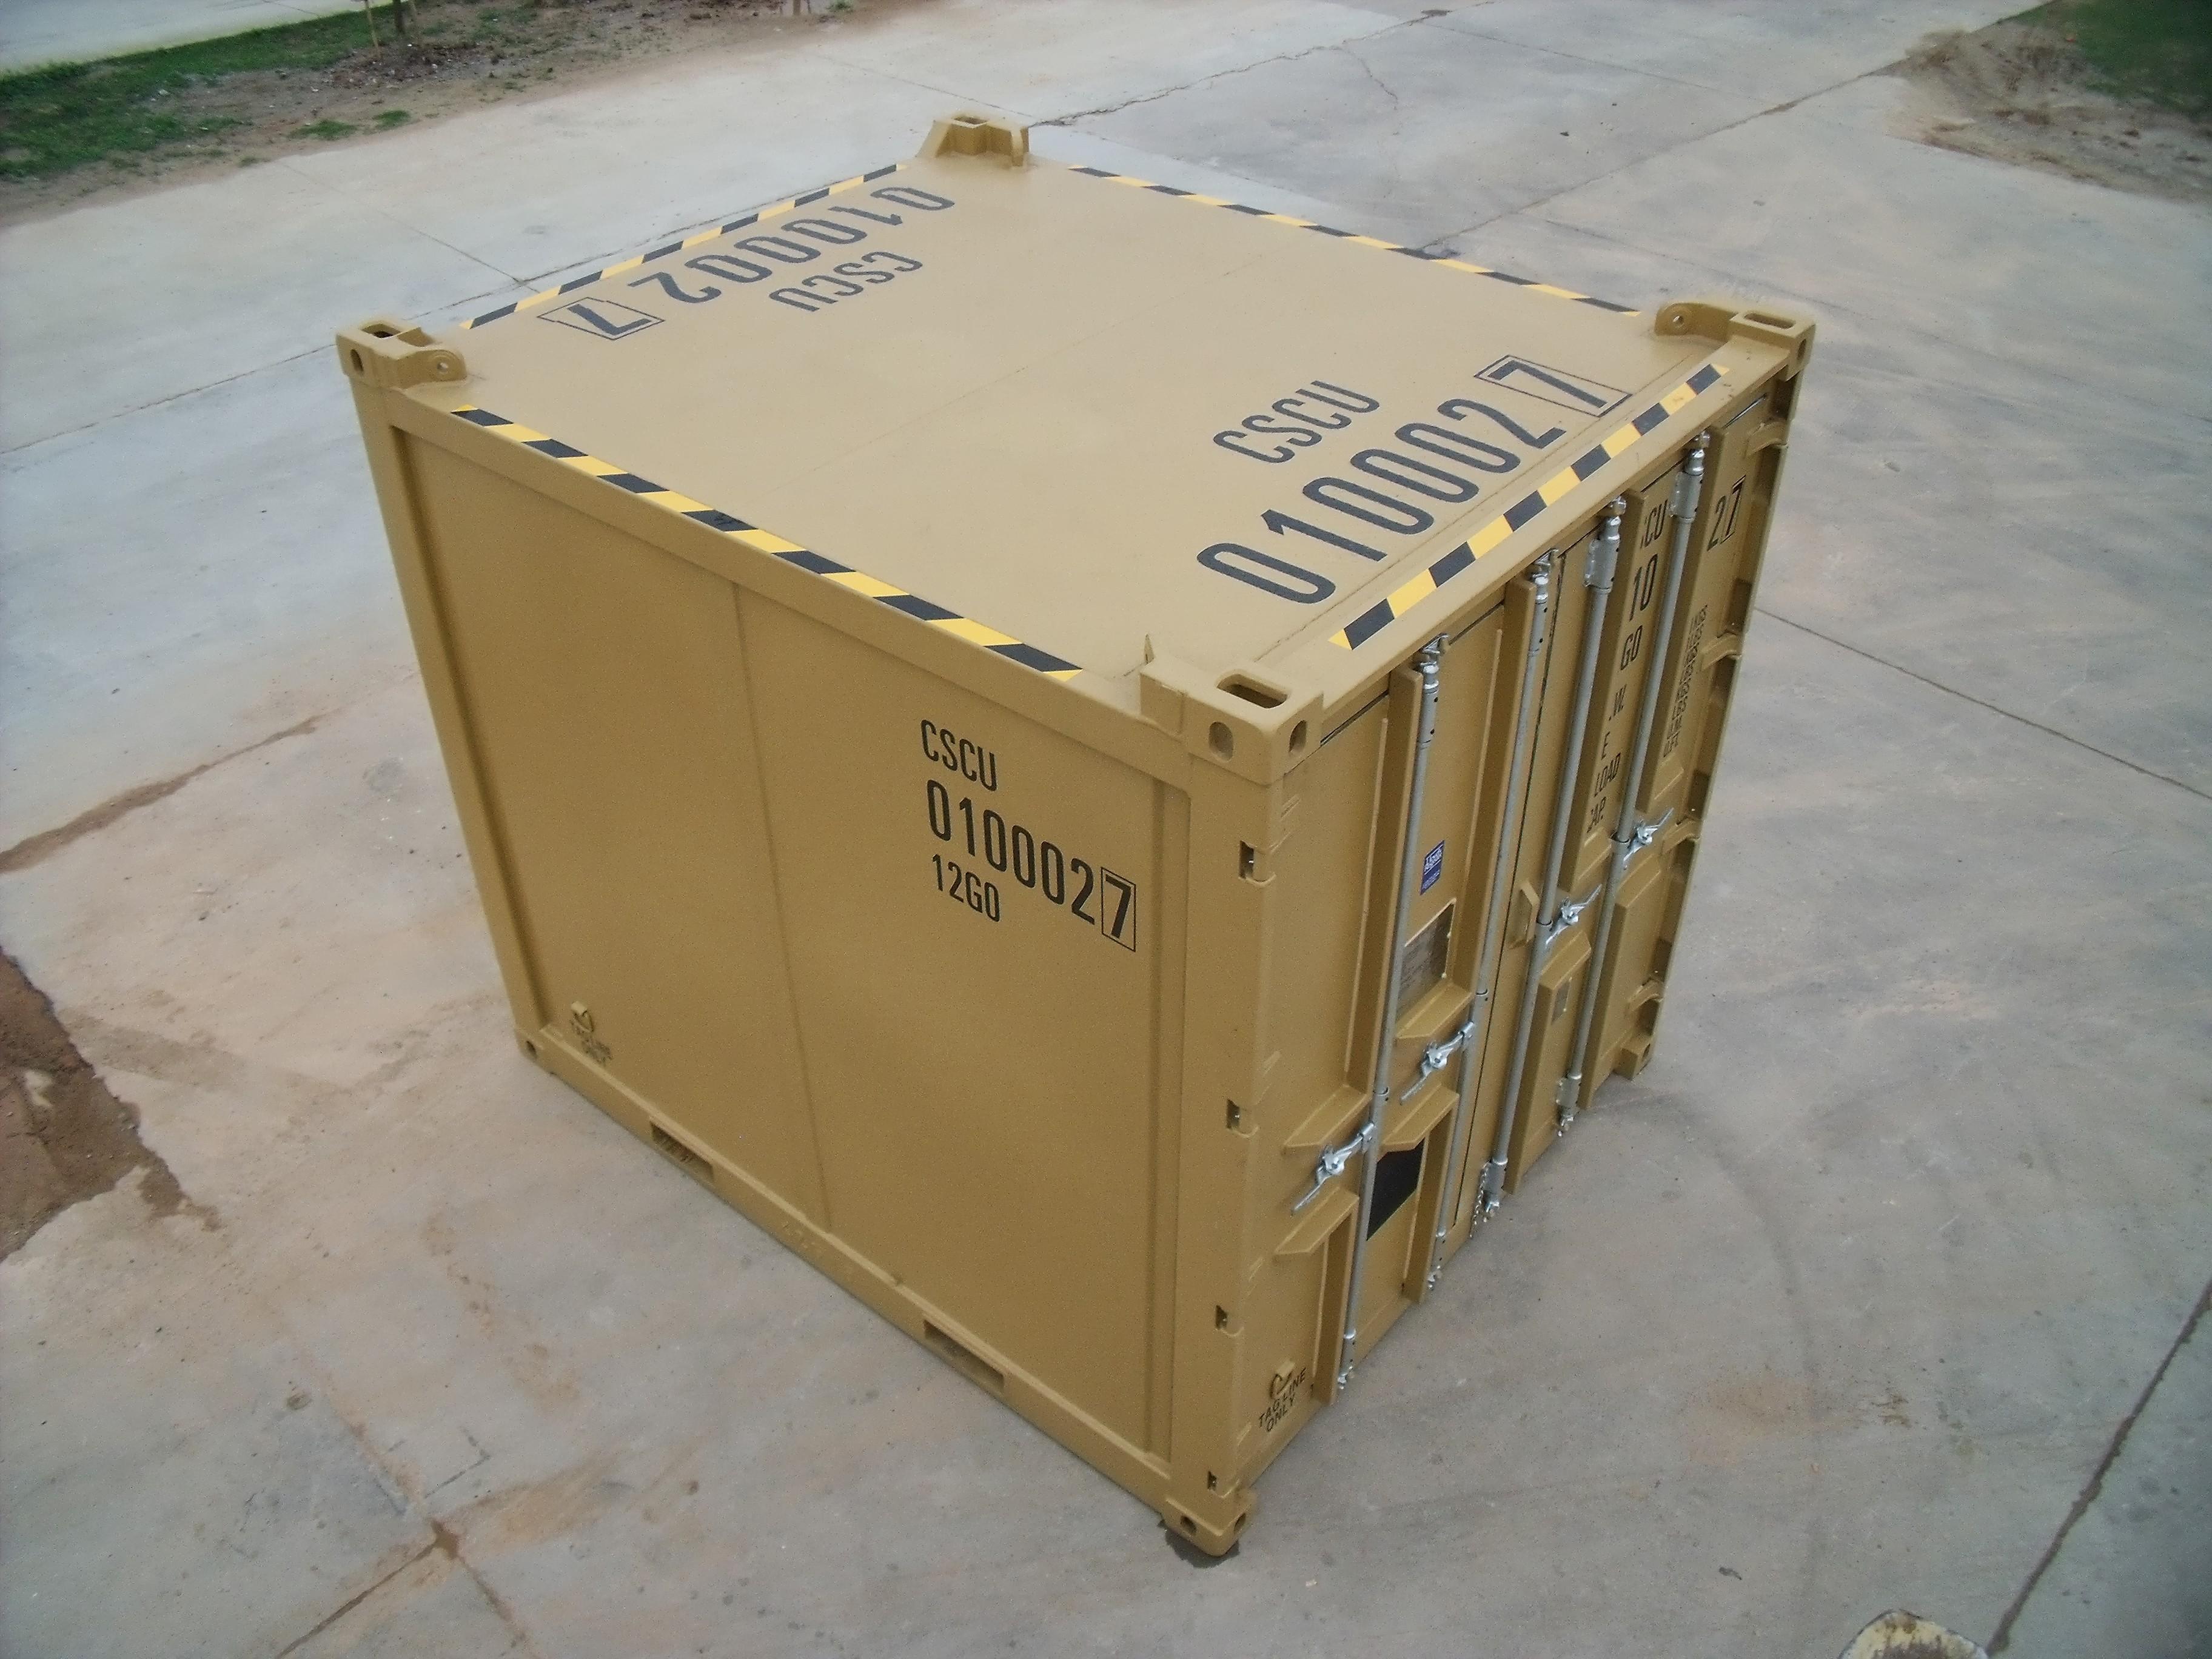 10ft 2.7-1, EN 12079 offshore container - Exterior